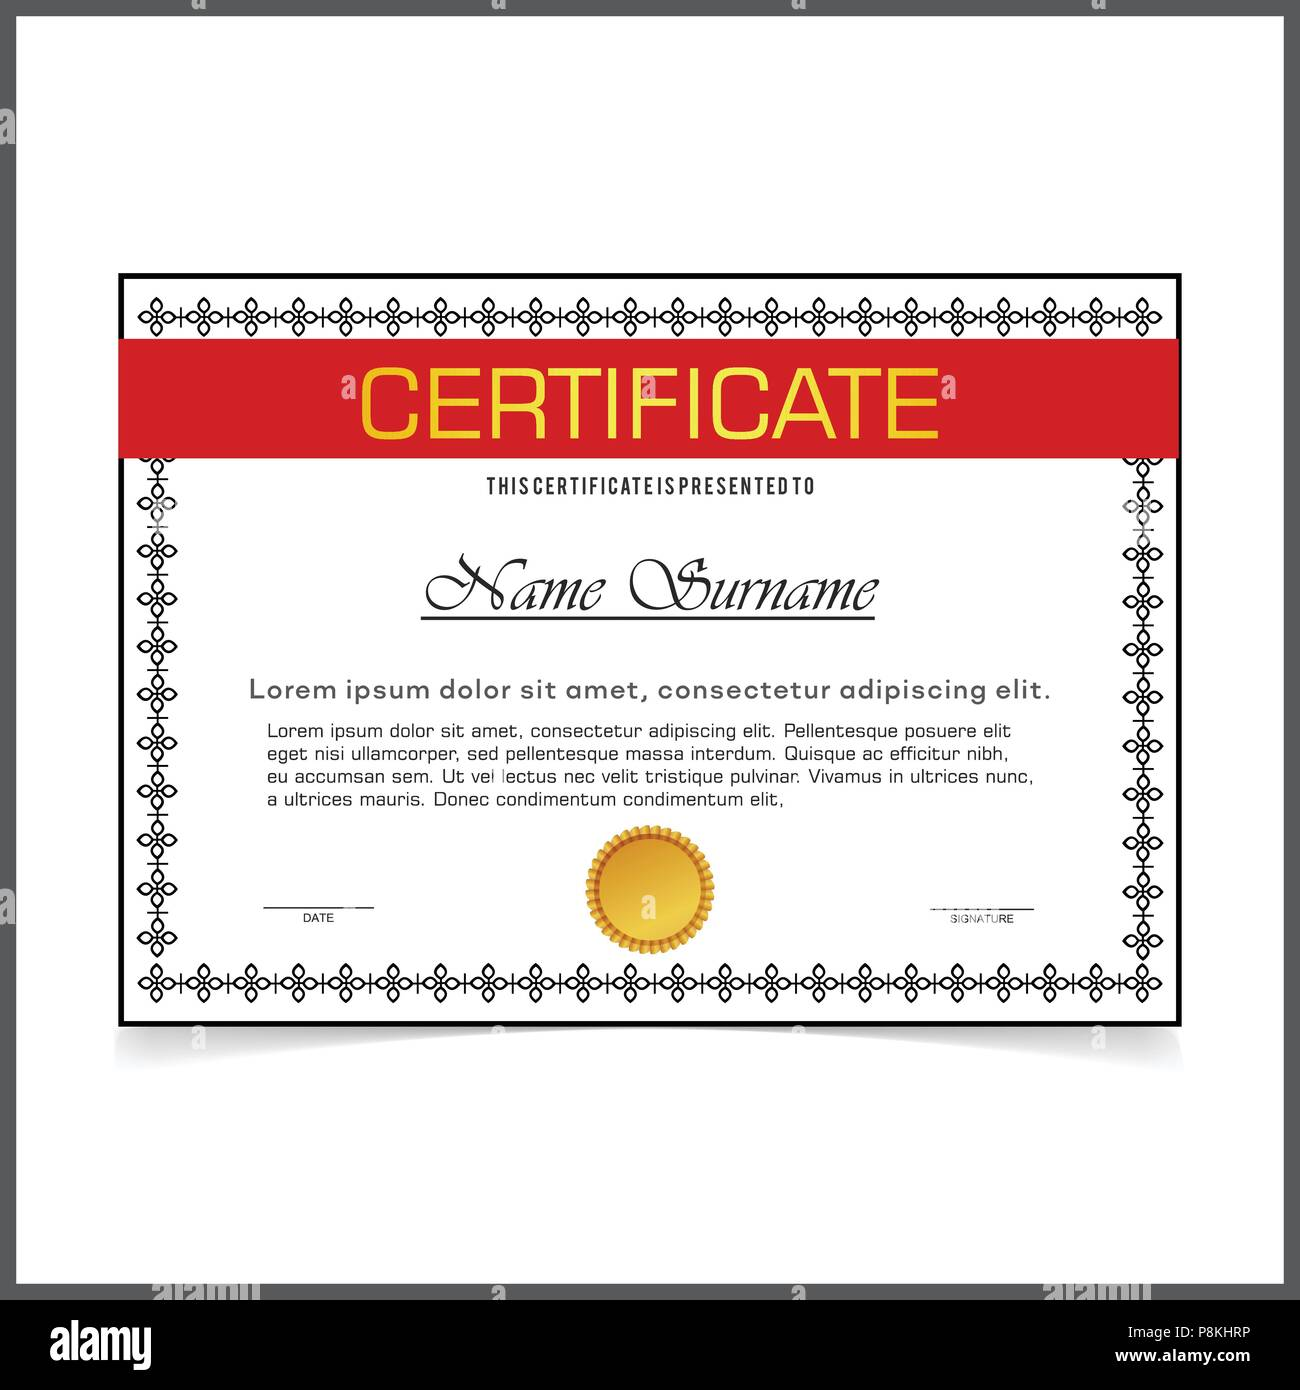 Shares Certificate Stockfotos & Shares Certificate Bilder - Seite 3 ...